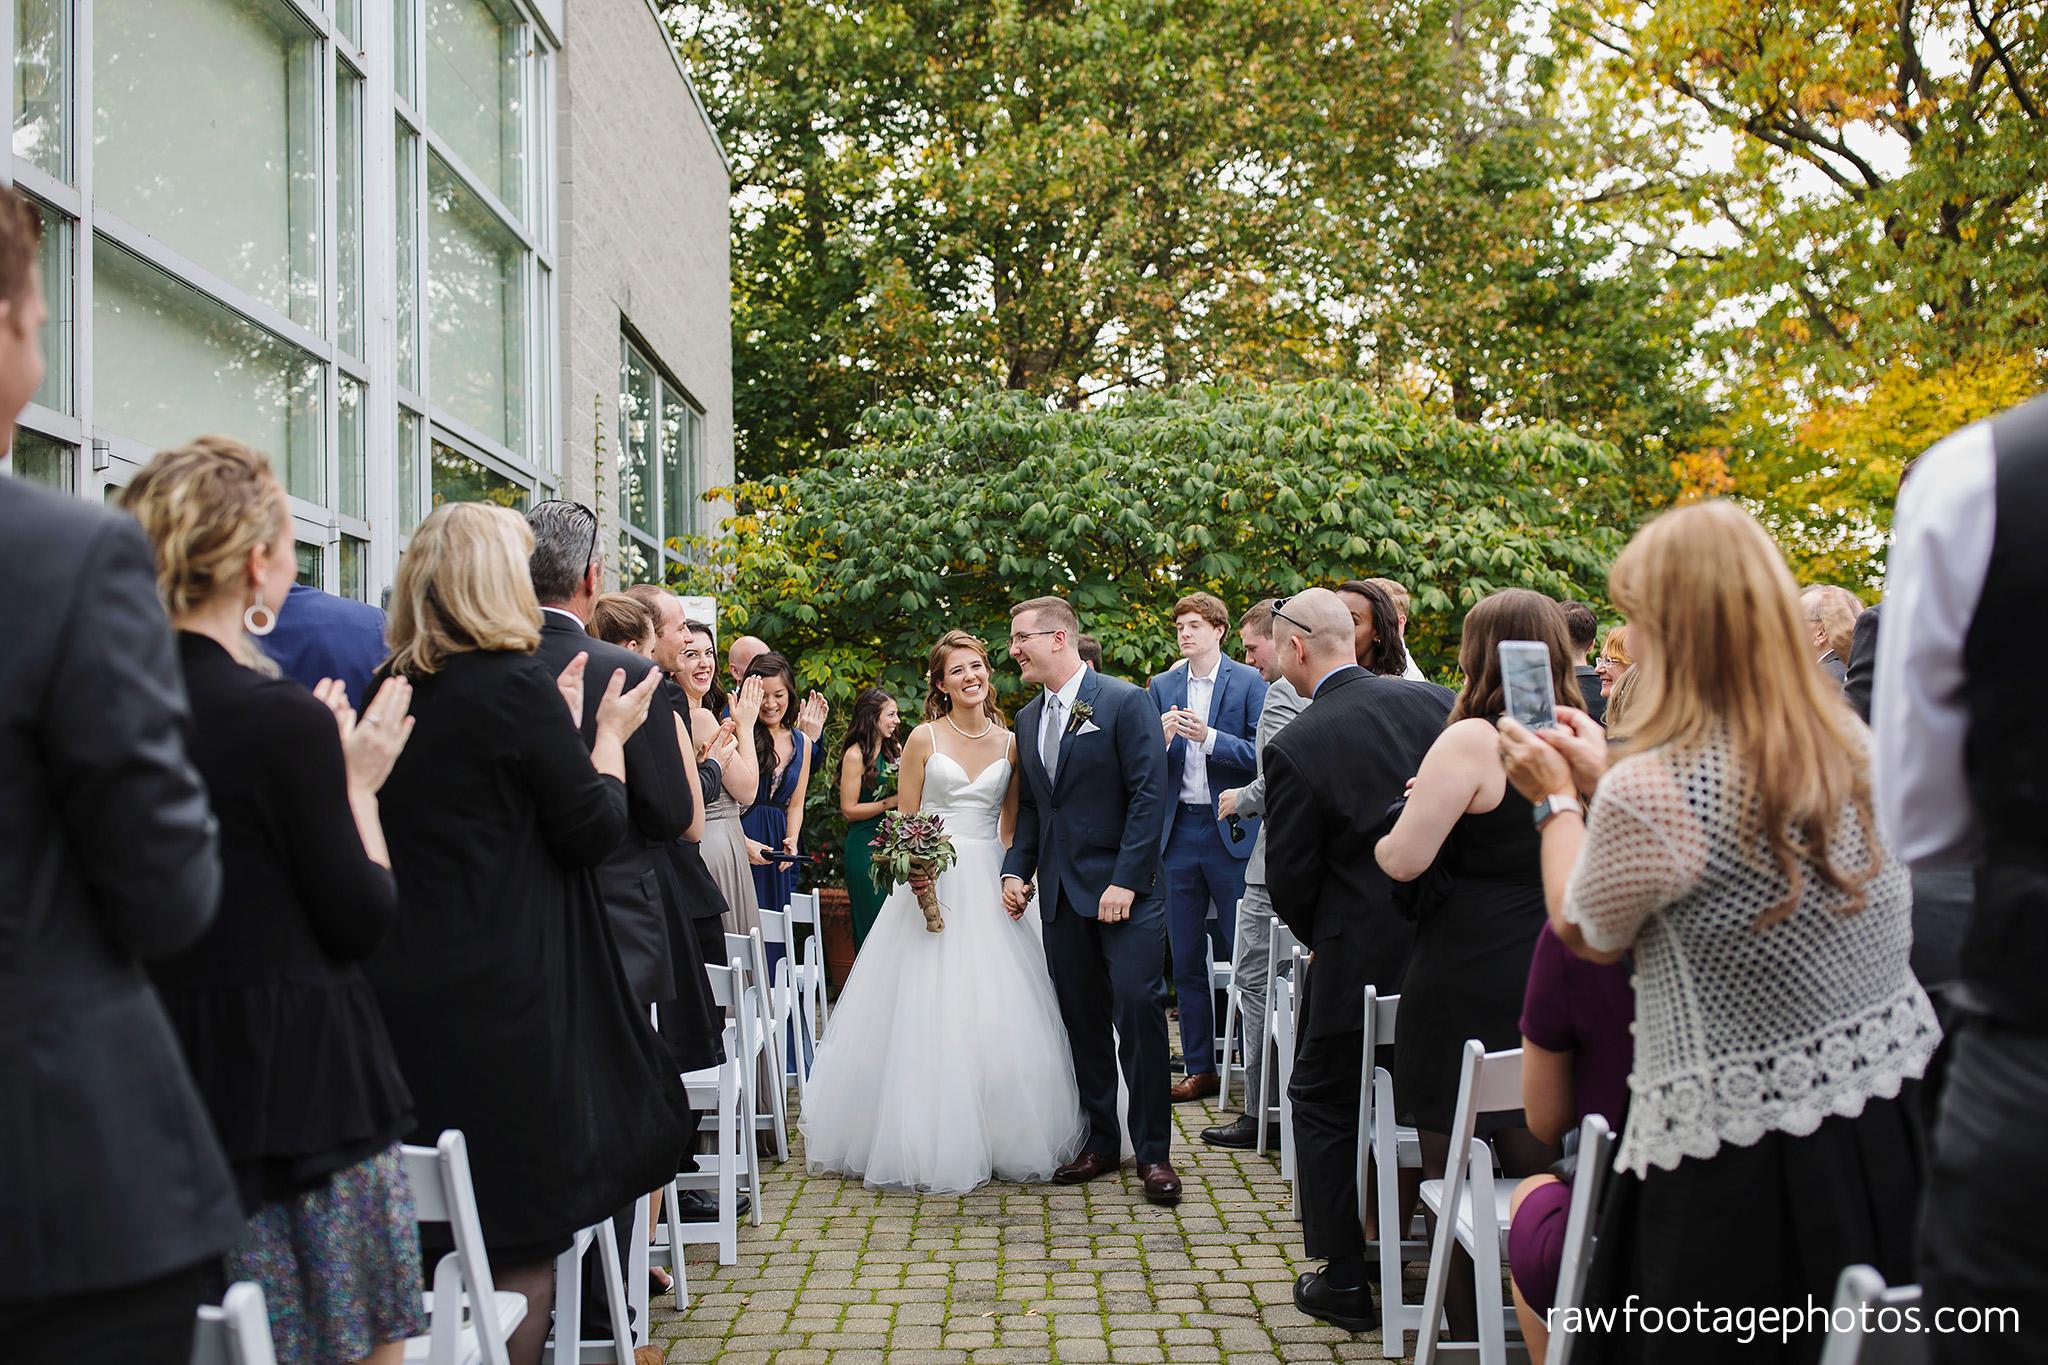 london_ontario_wedding_photographer-civic_gardens-springbank_park-succulent_bouquet-fall_wedding-bridge-raw_footage_photography042.jpg